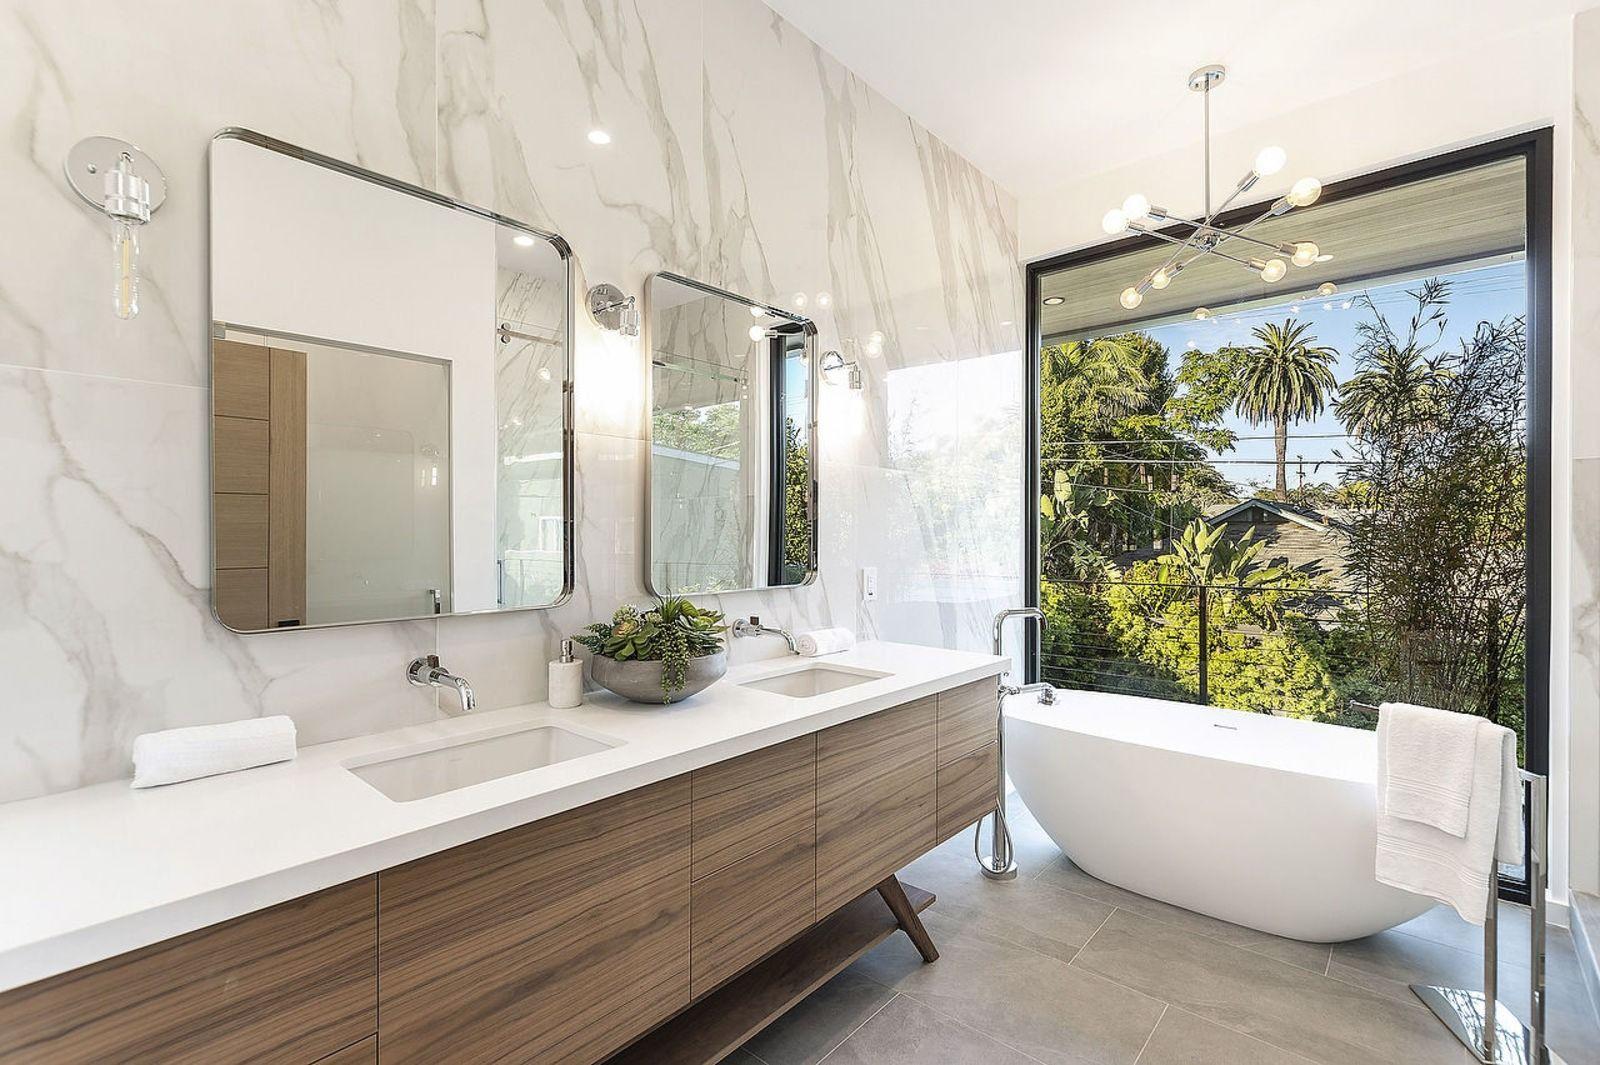 Stunning marble wall in Los Angeles modern bathroom. #ihavethisthingwithtile #happyhomedesigner #luxuryhomedesign #luxuryhomedecor #luxuryrealestate #customhome #homedesigner #homedesigners #designerhomes #luxurylifestyle #hardscapebrotherhood #bathroomtile